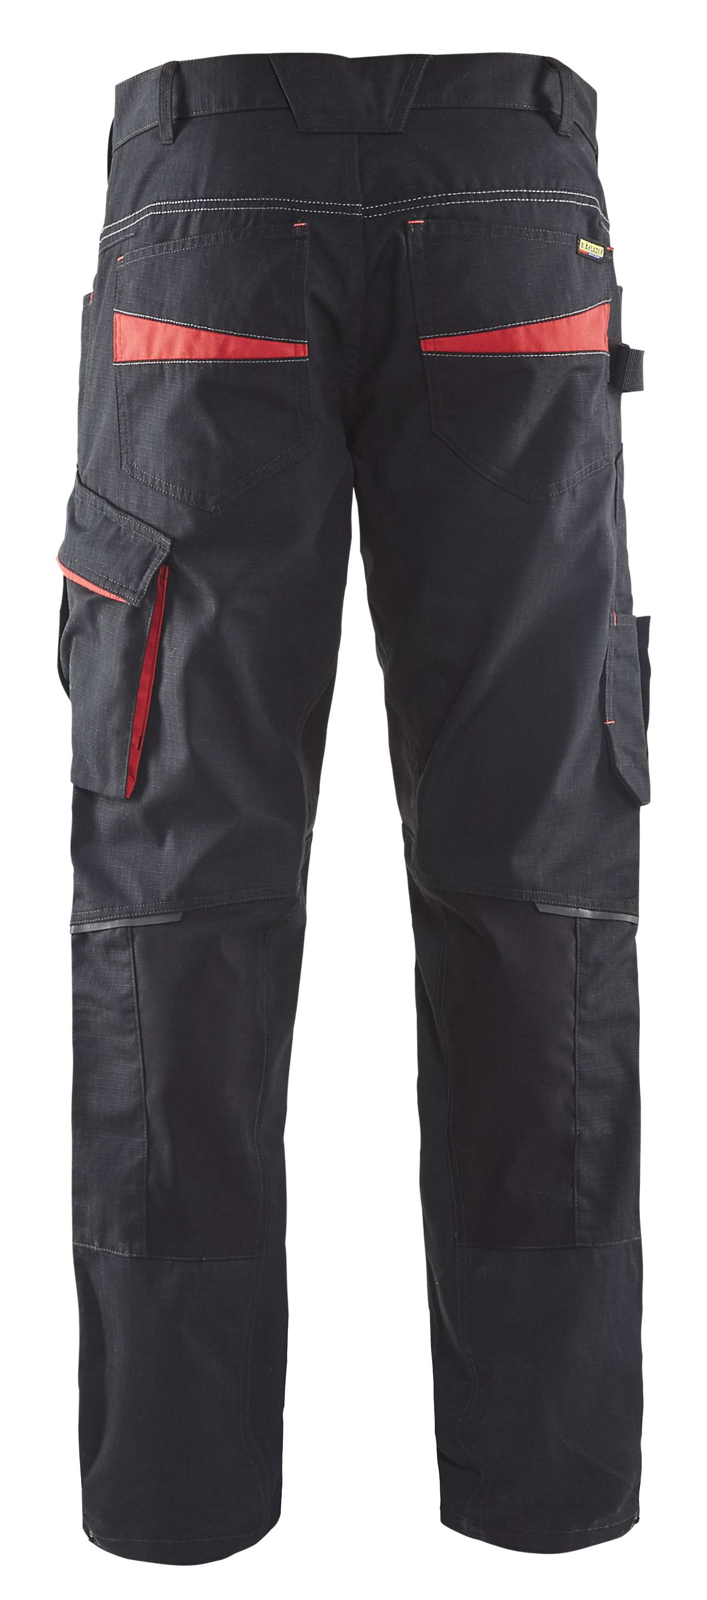 Blaklader Werkbroeken 14951330 met Stretch zwart-rood(9956)